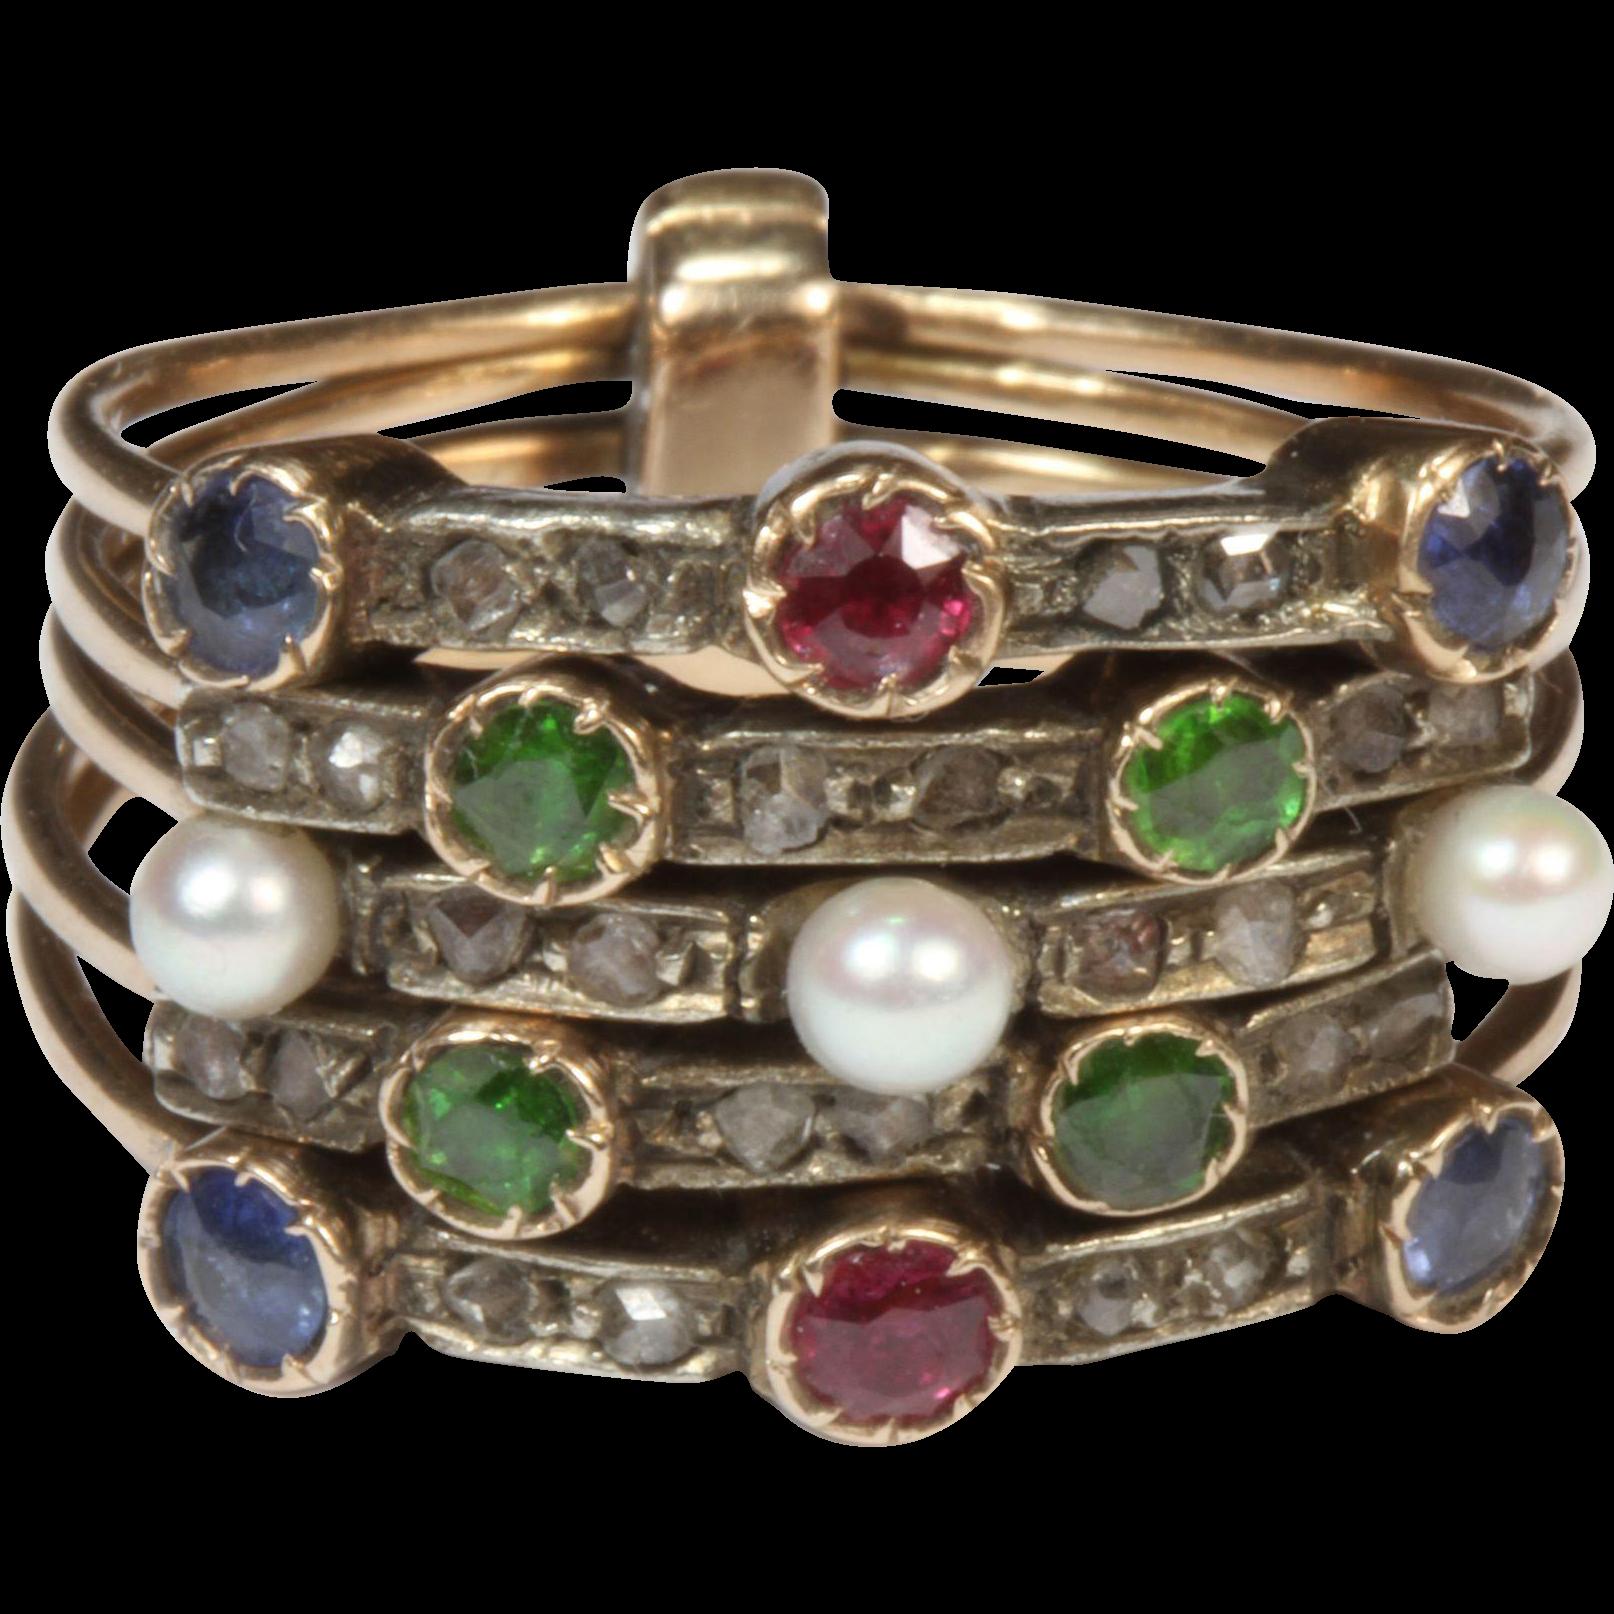 antique multi band harem gemstone ring from